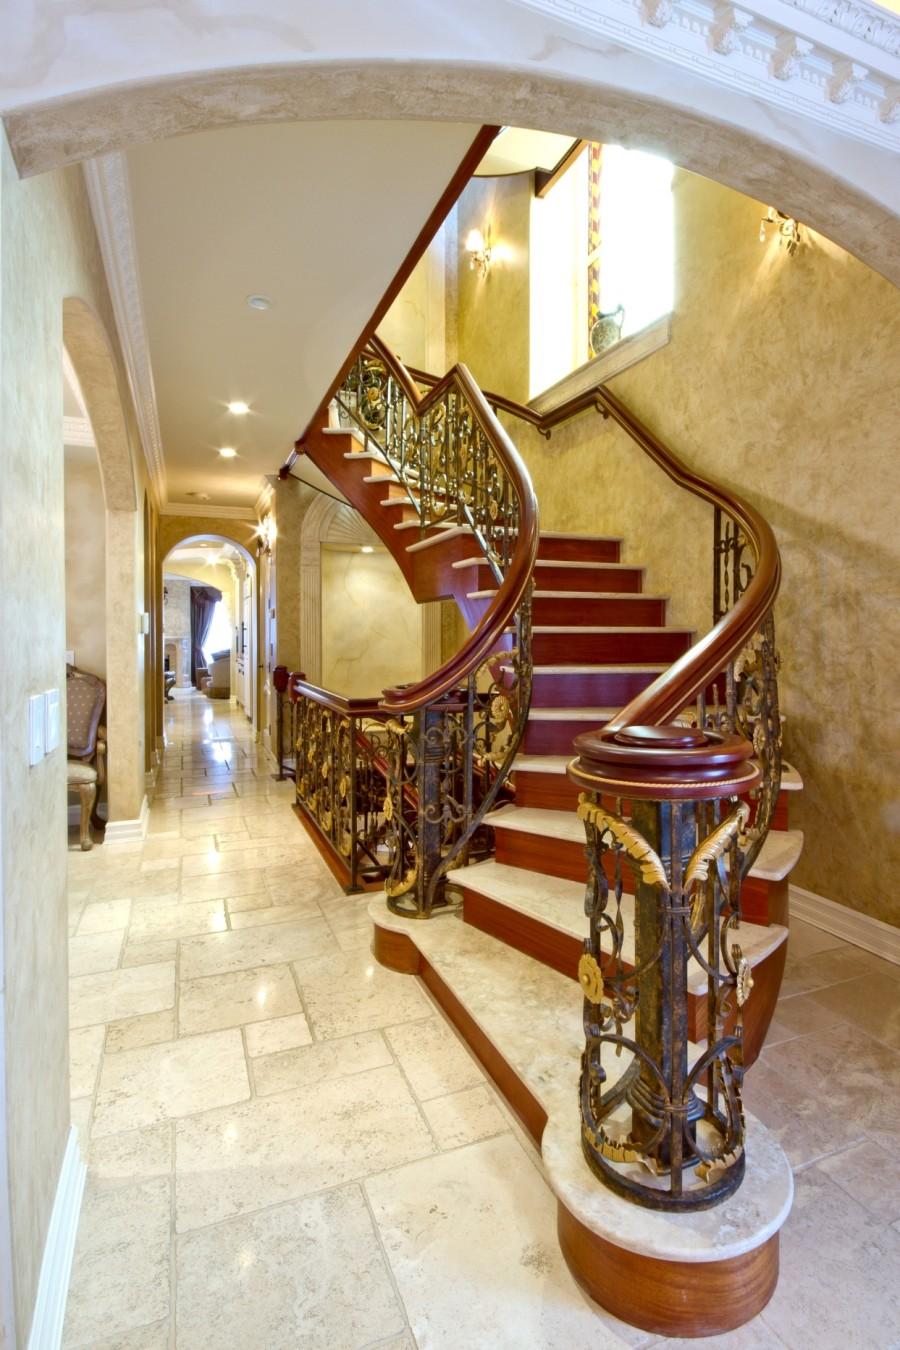 UC_stairs.jpg